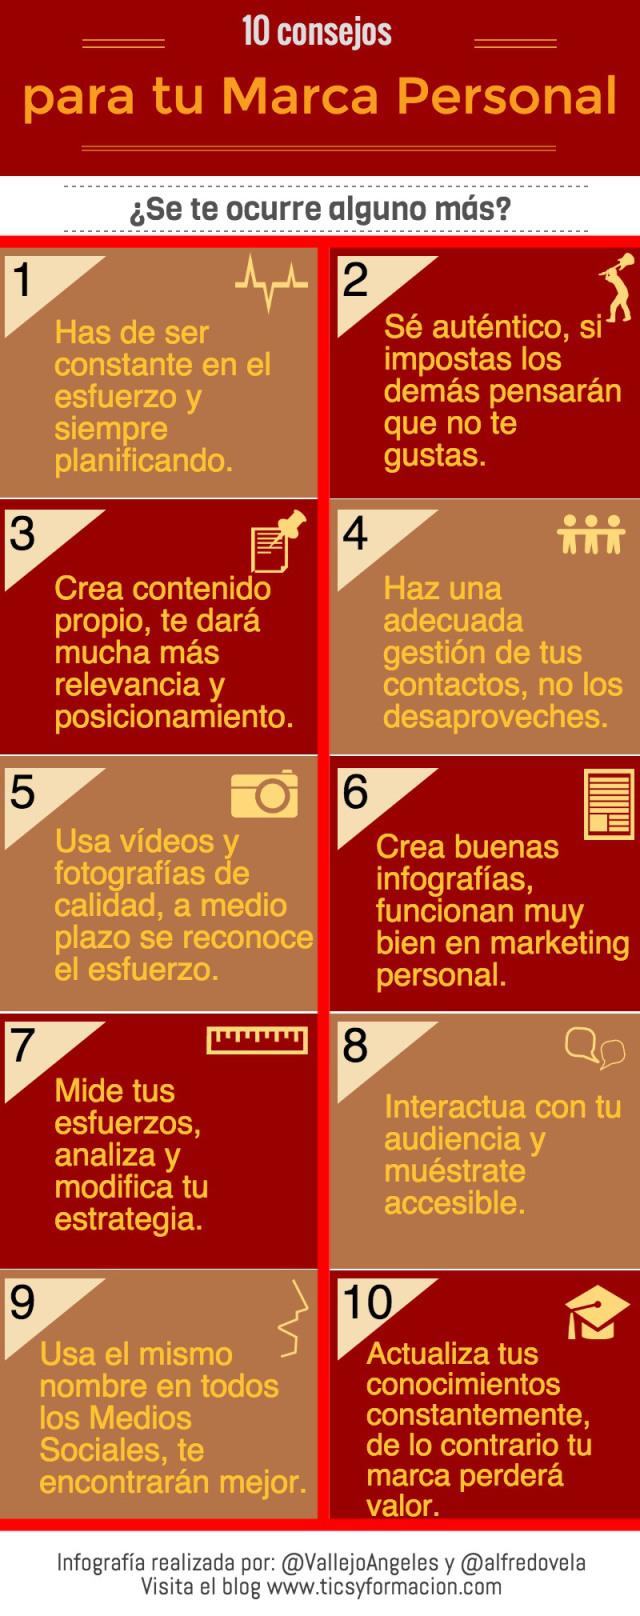 10-consejos-marca-personal-infografia